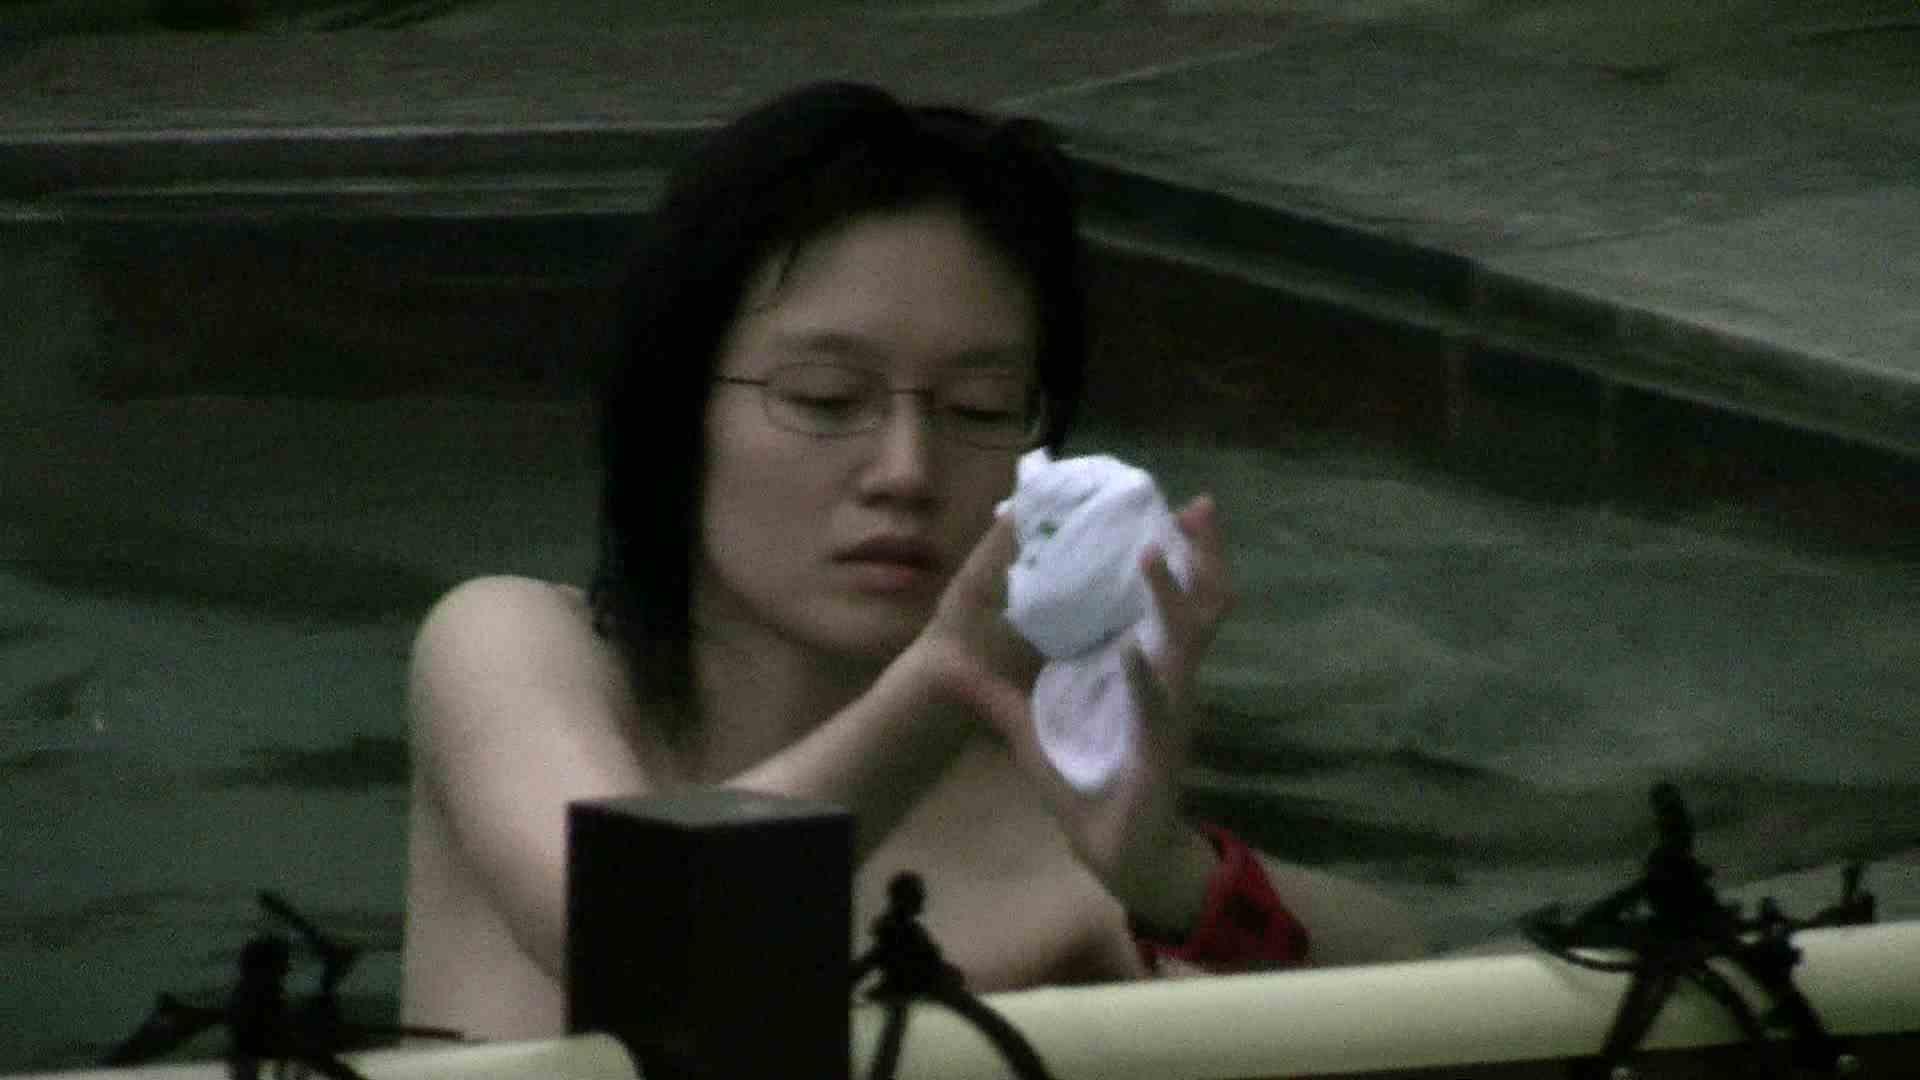 Aquaな露天風呂Vol.684 HなOL オメコ動画キャプチャ 87pic 2